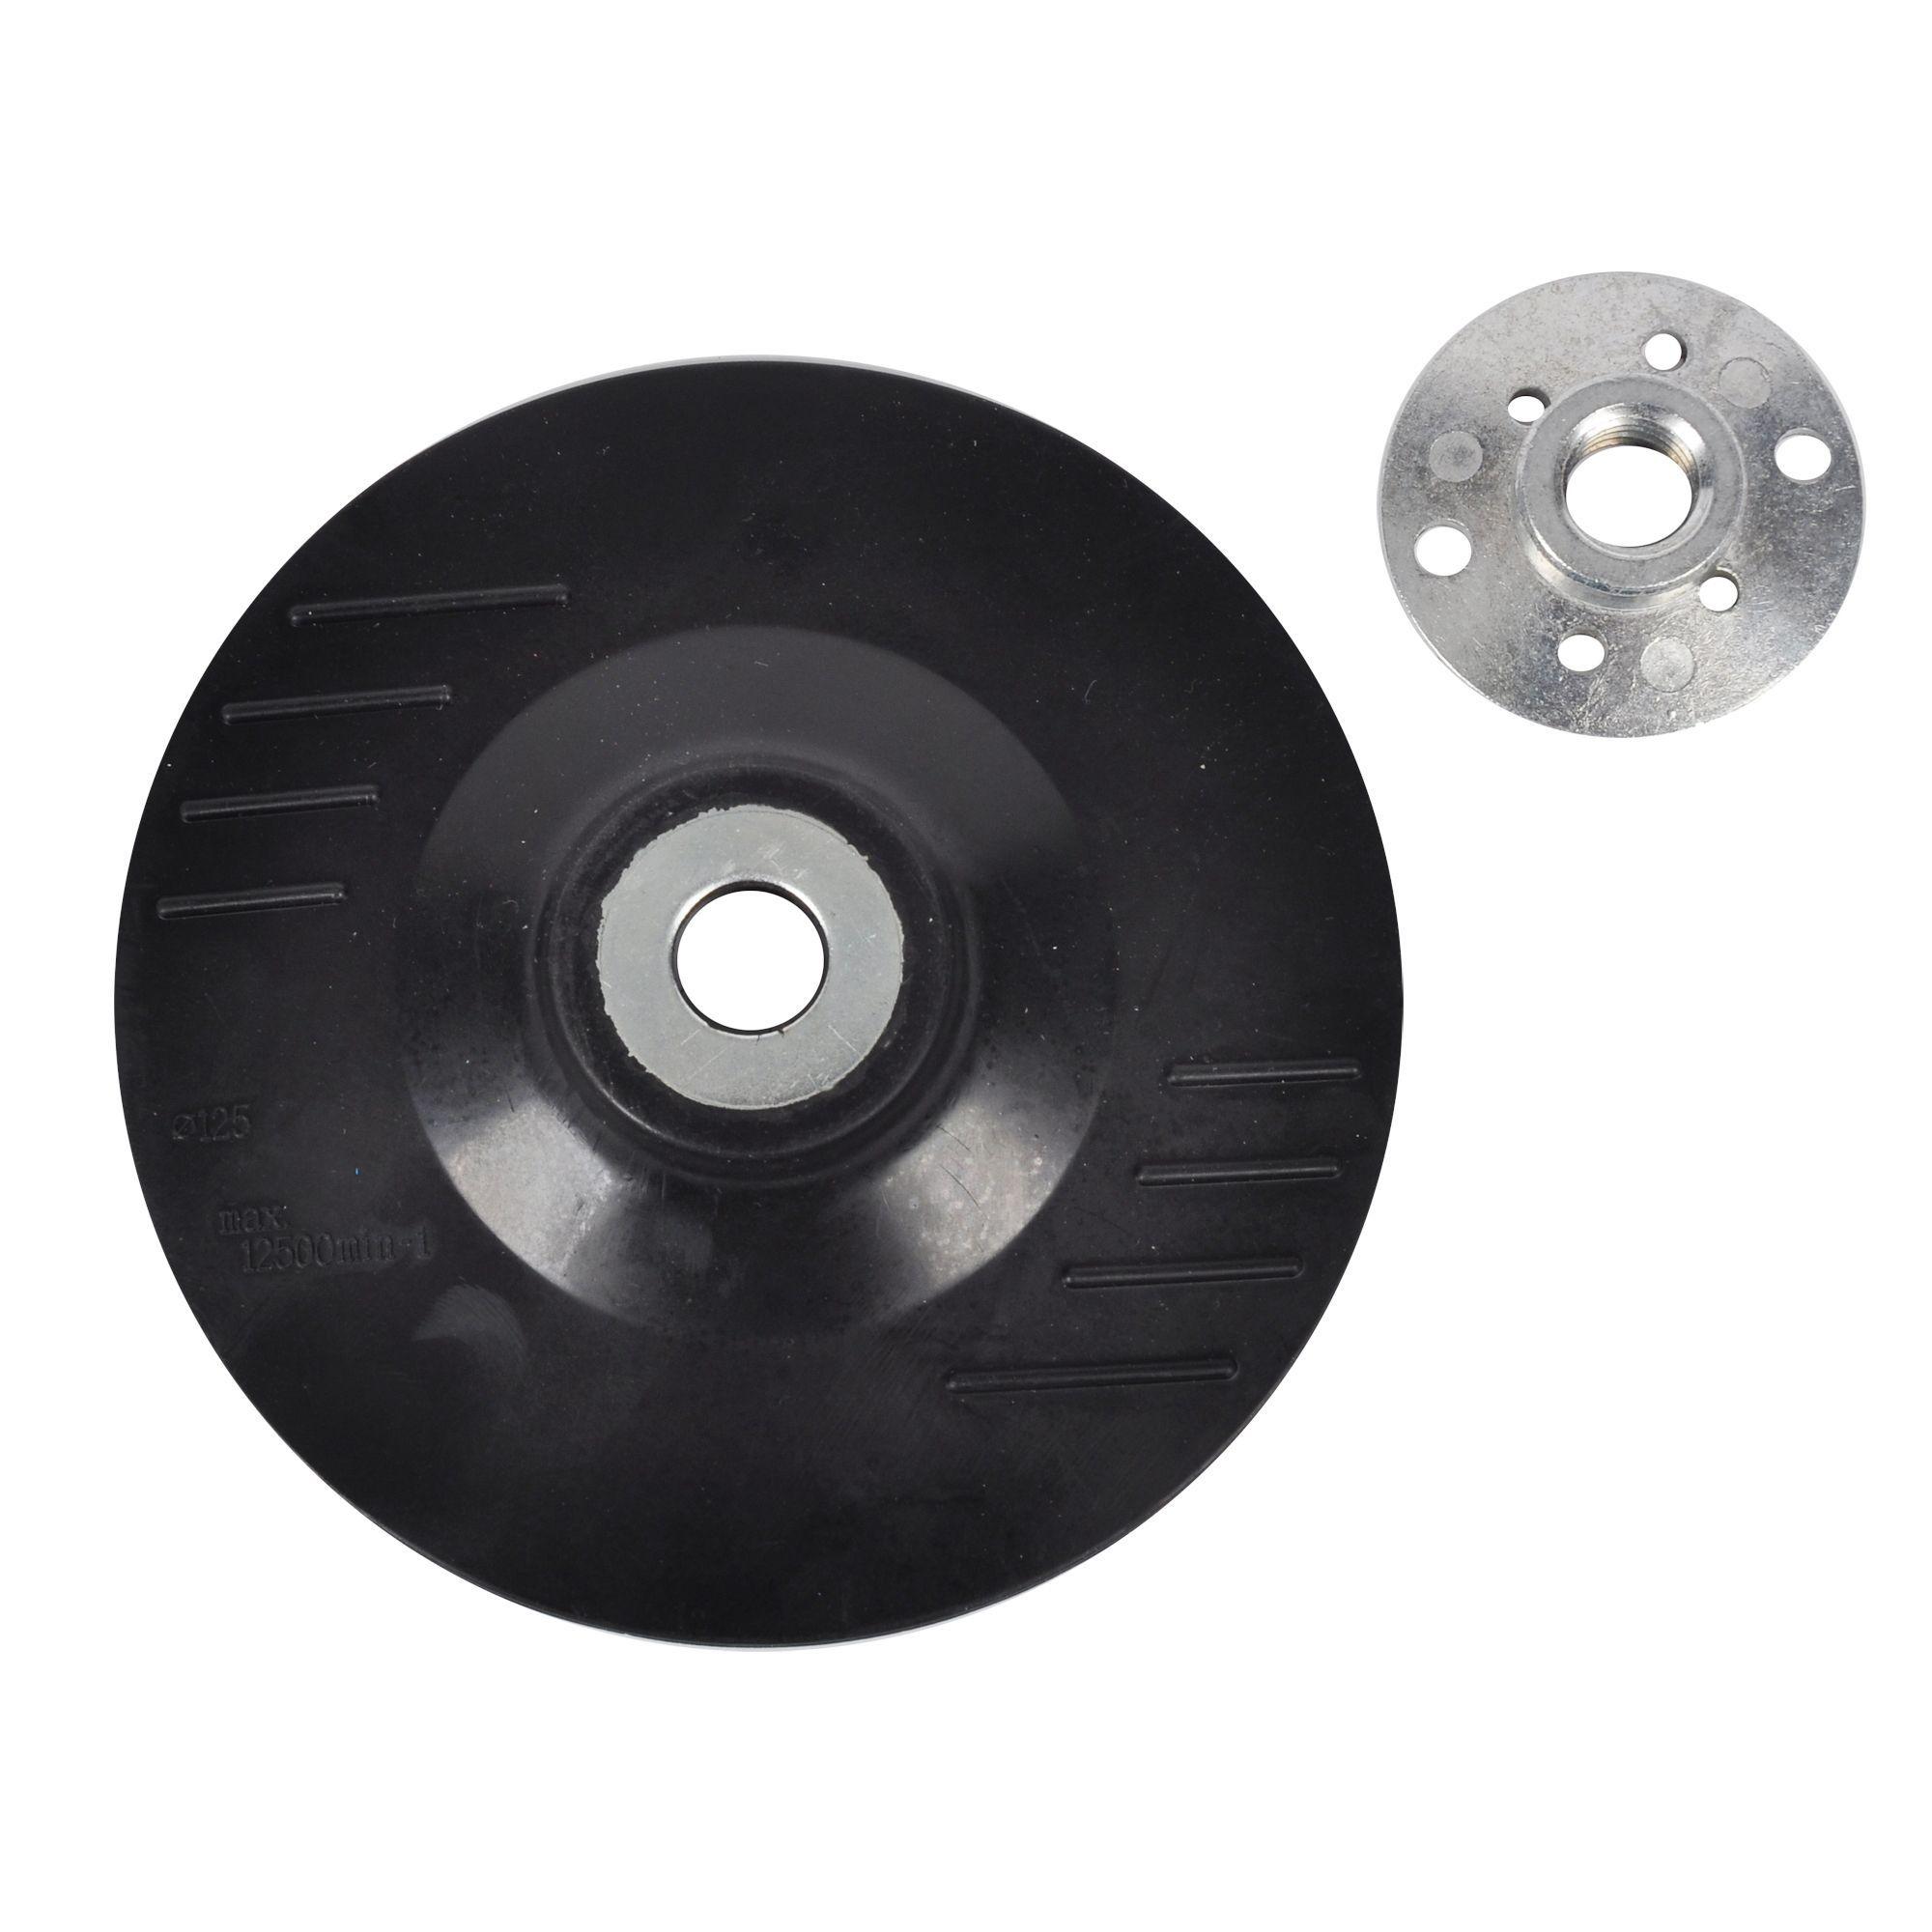 Ptx Grinder Sanding Plate (dia)125mm Of 1